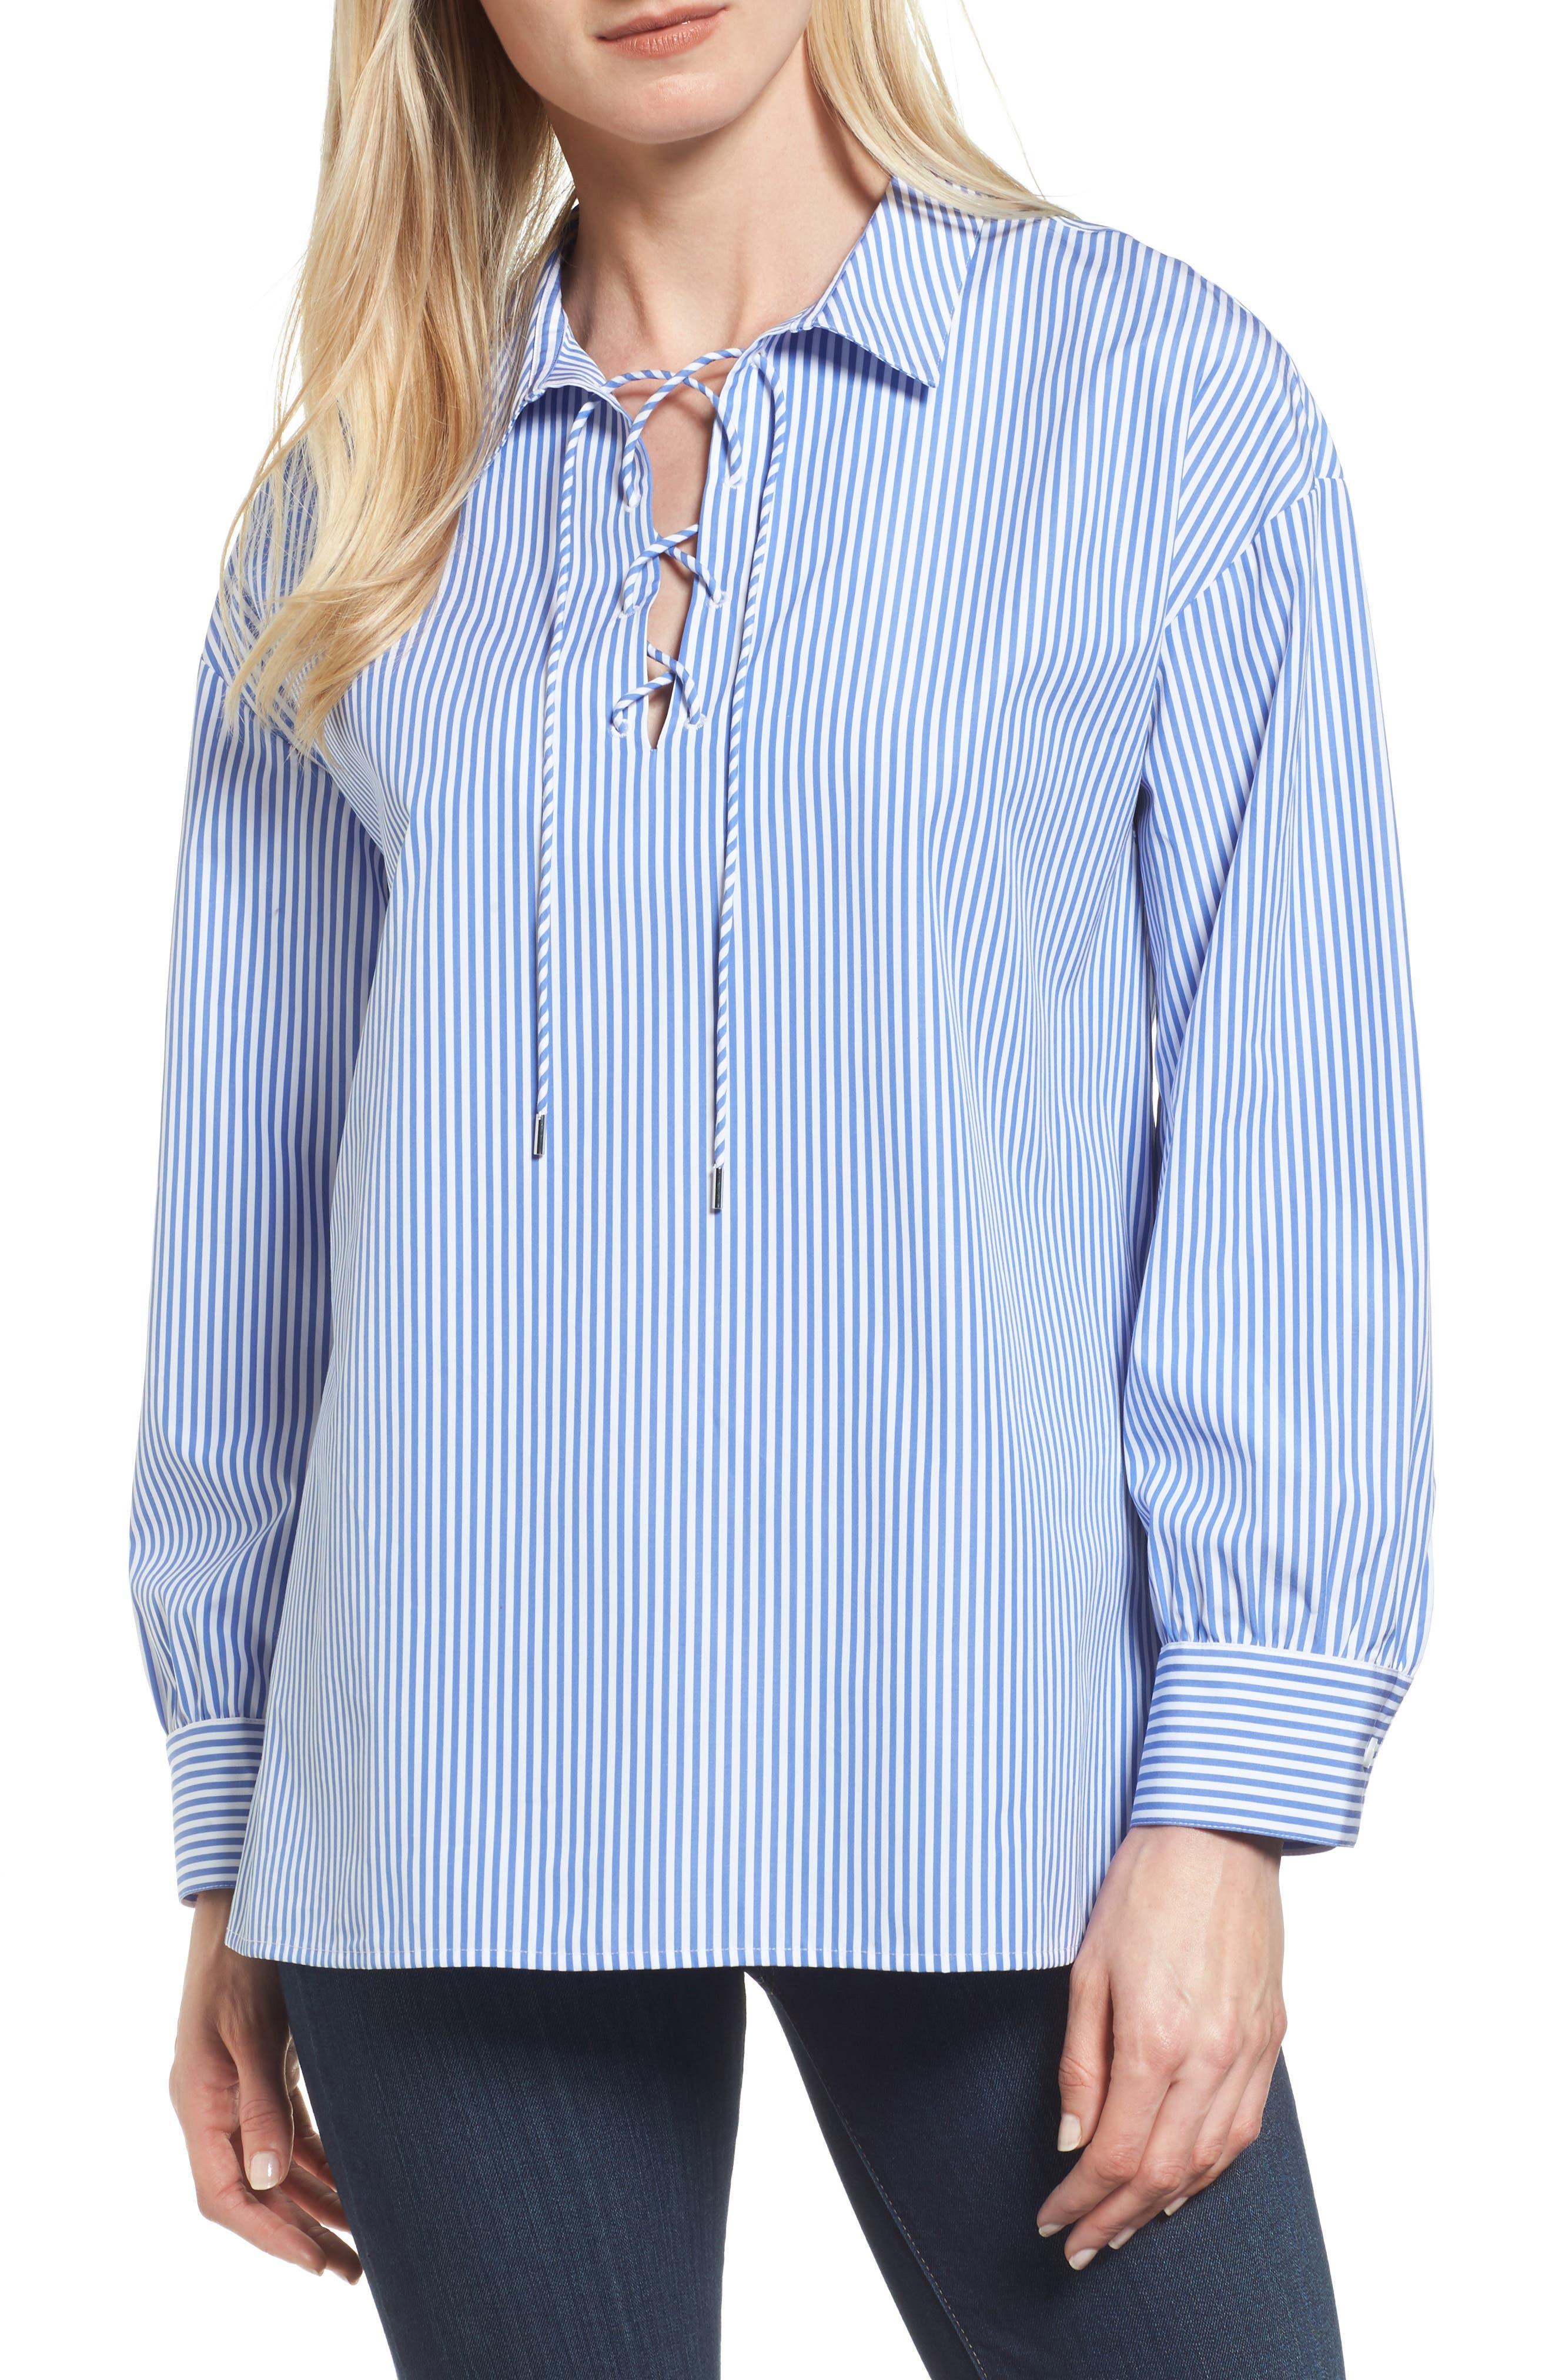 Main Image - Nordstrom Signature Lace-Up Stripe Shirt